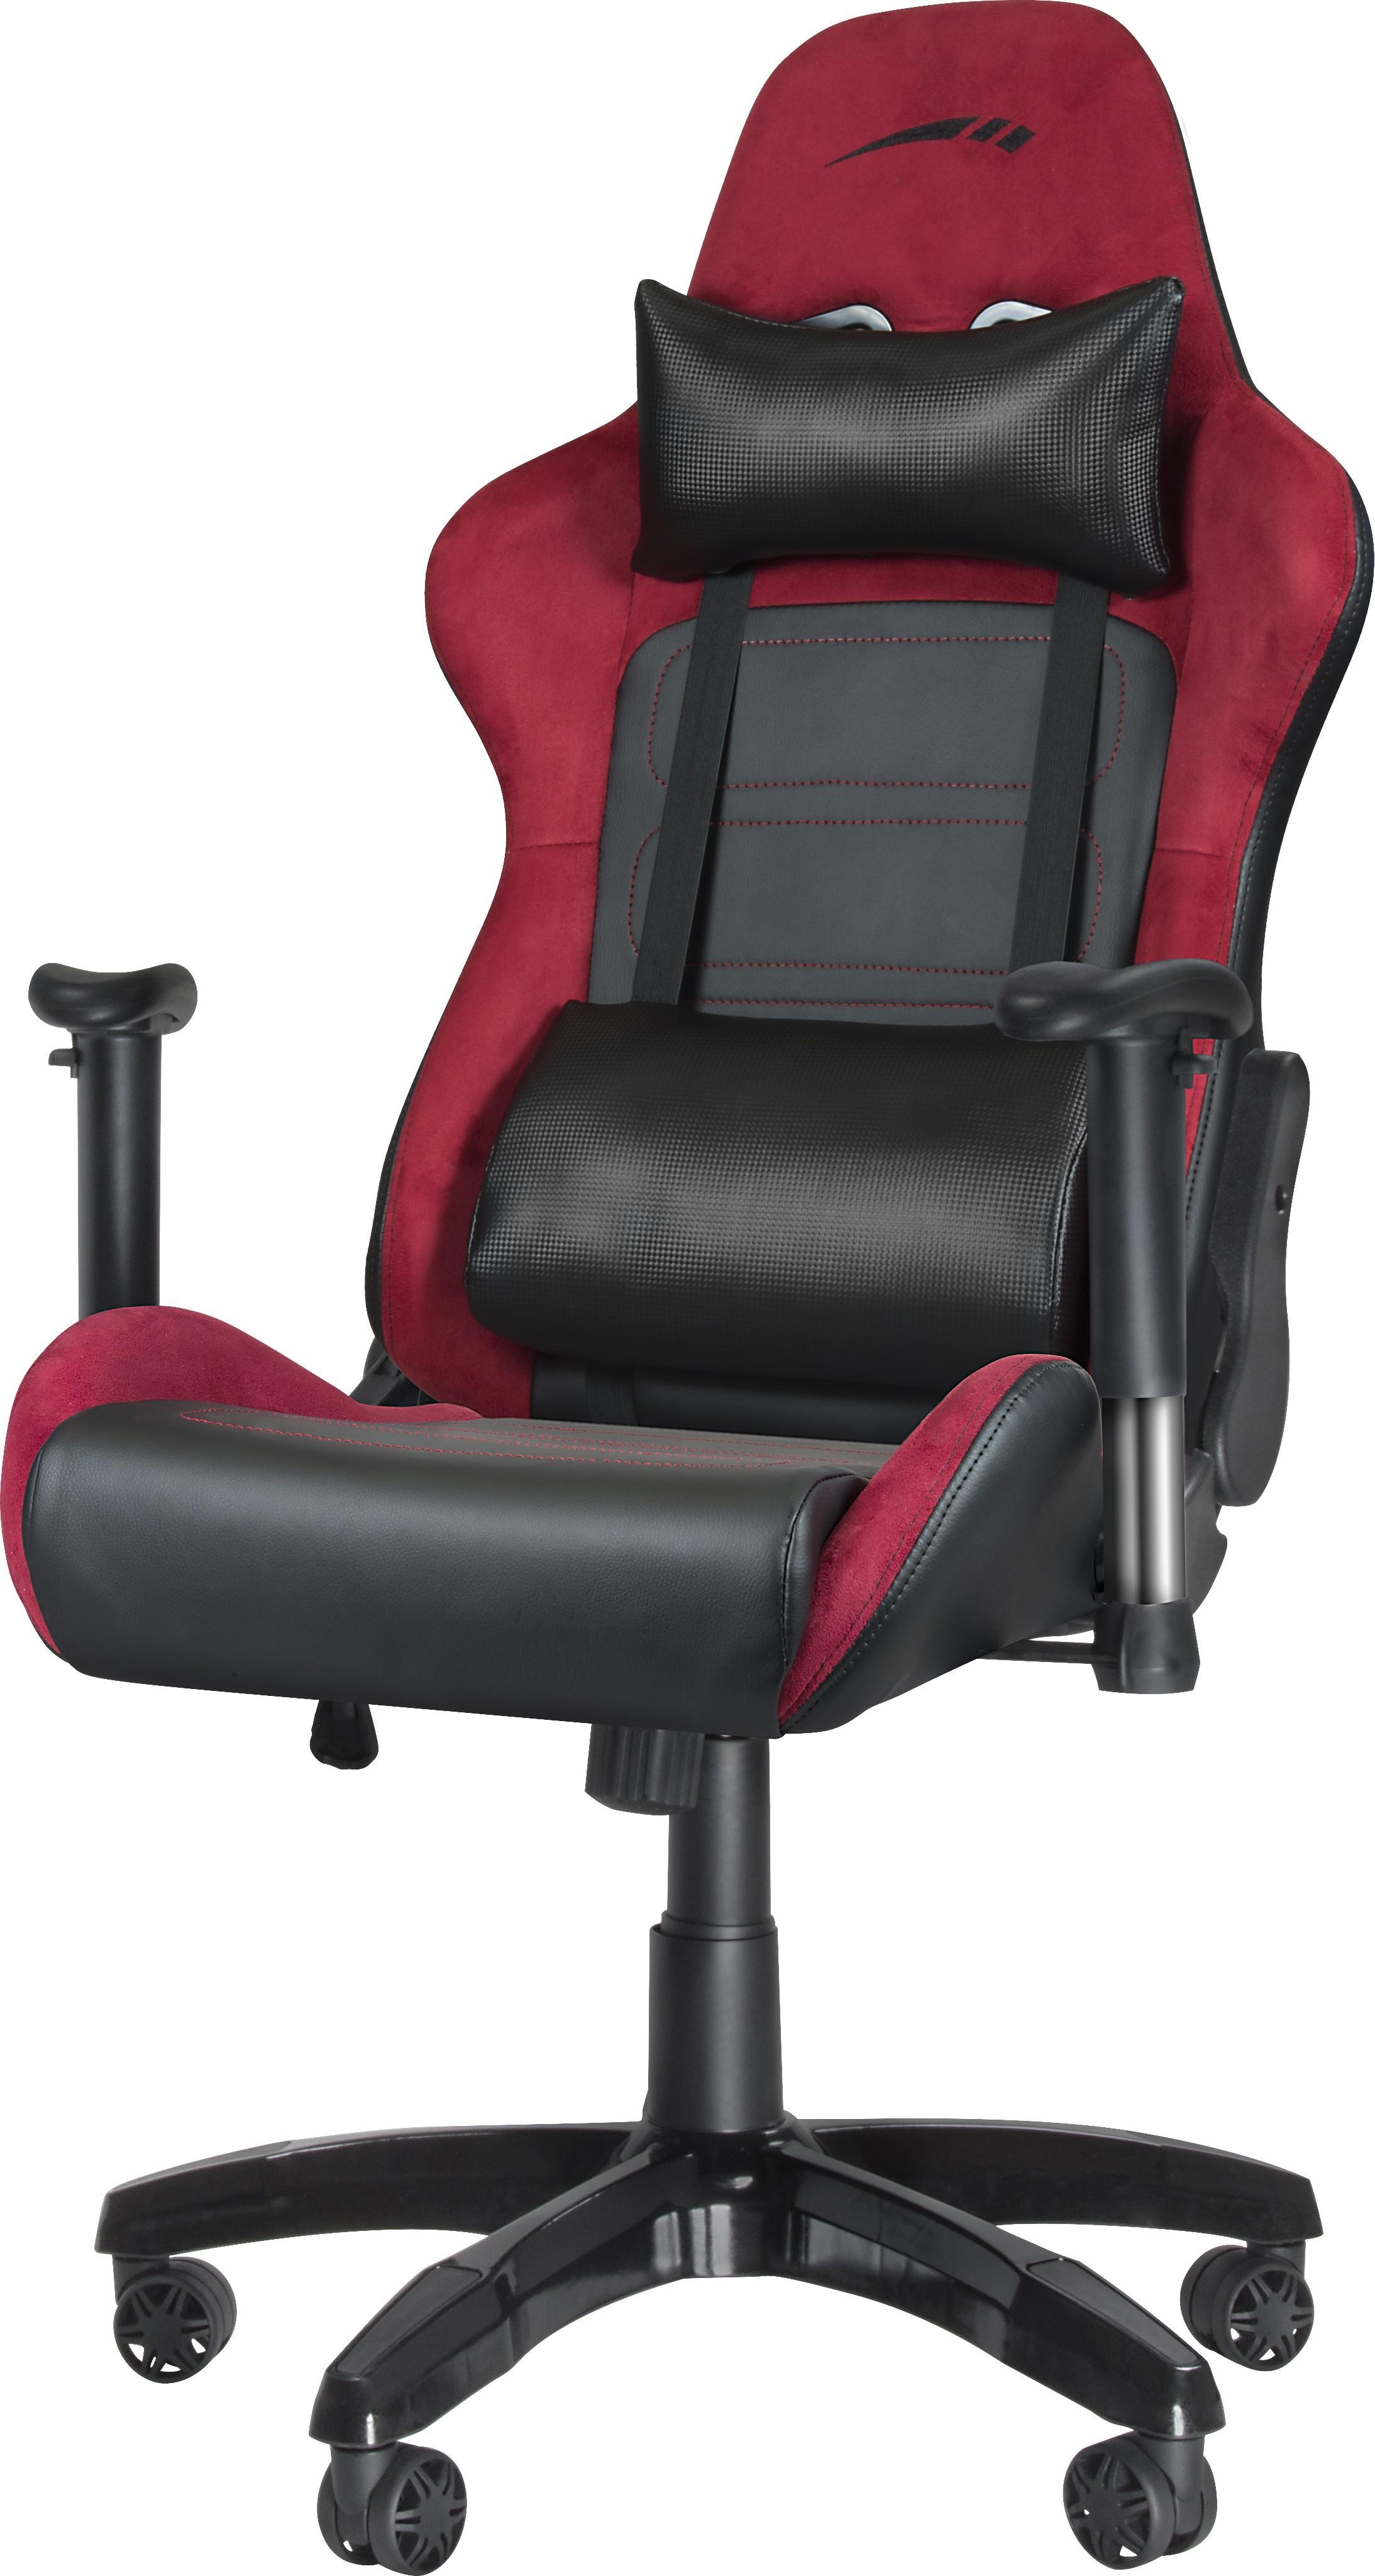 Speedlink geimeru krēsls Regger (SL-660000-RD01) 4027301873337 SL-660000-RD-01